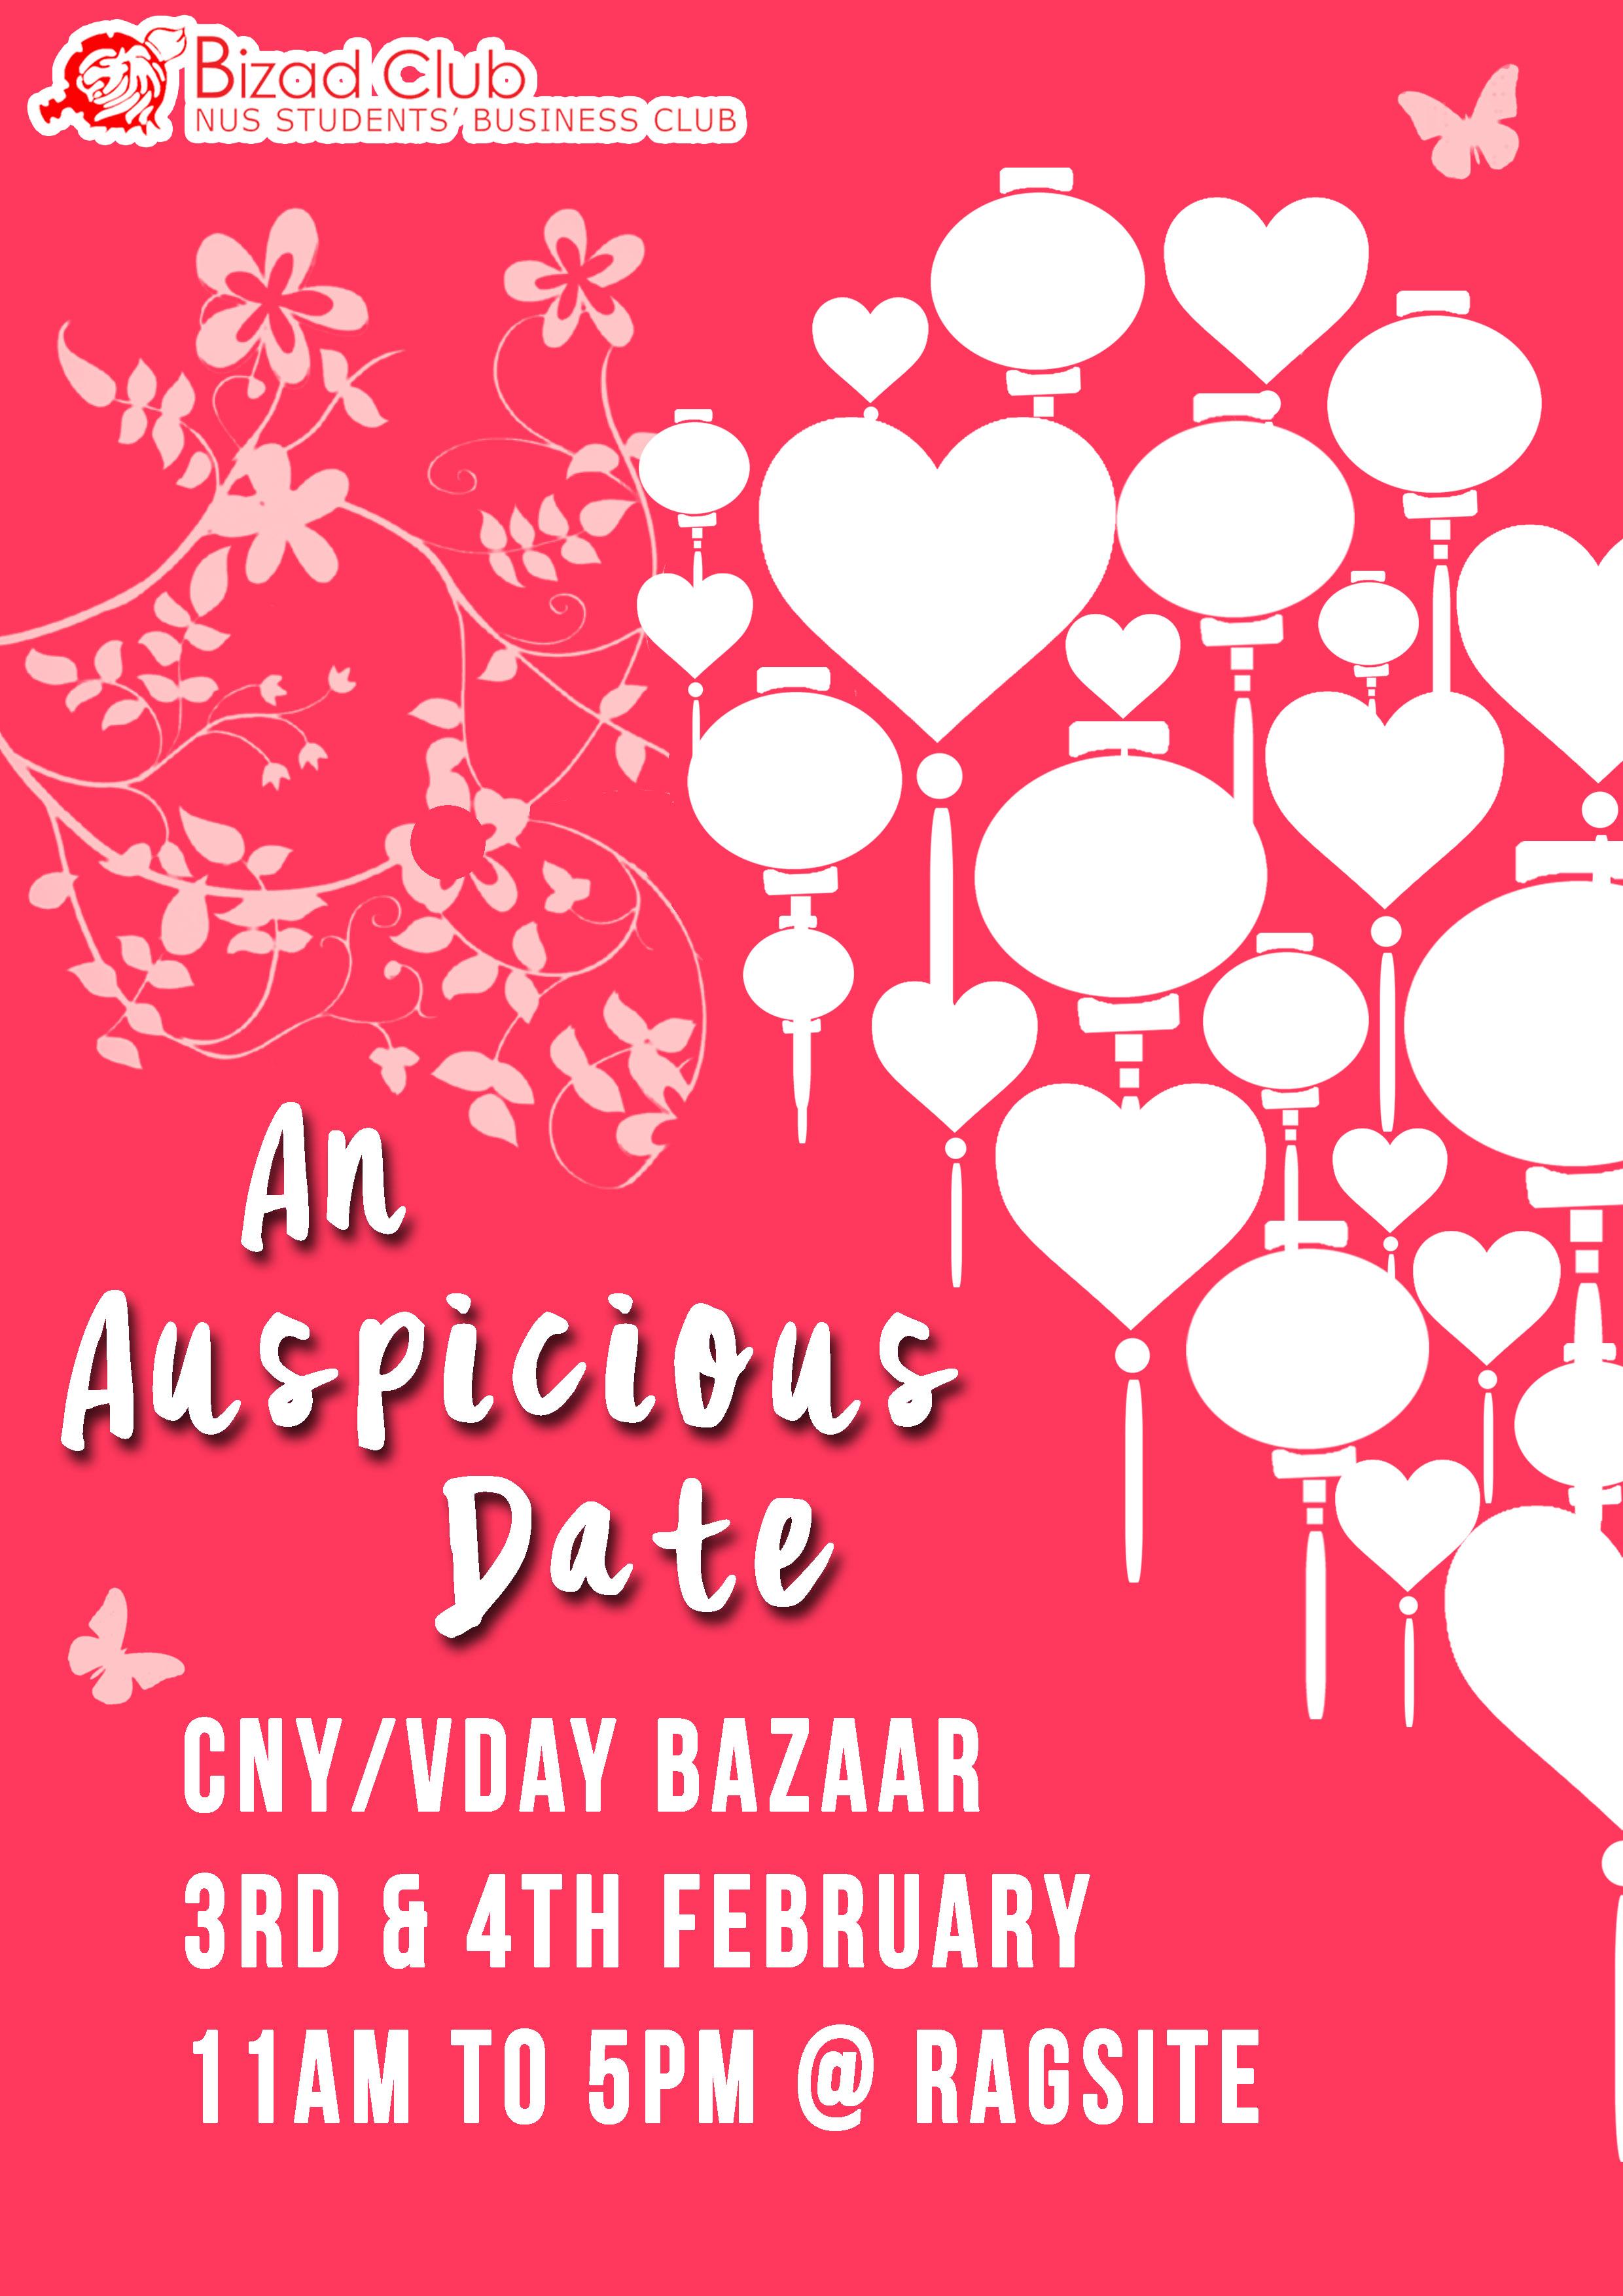 biz dev cnyxvday - Chinese New Year 2016 Date